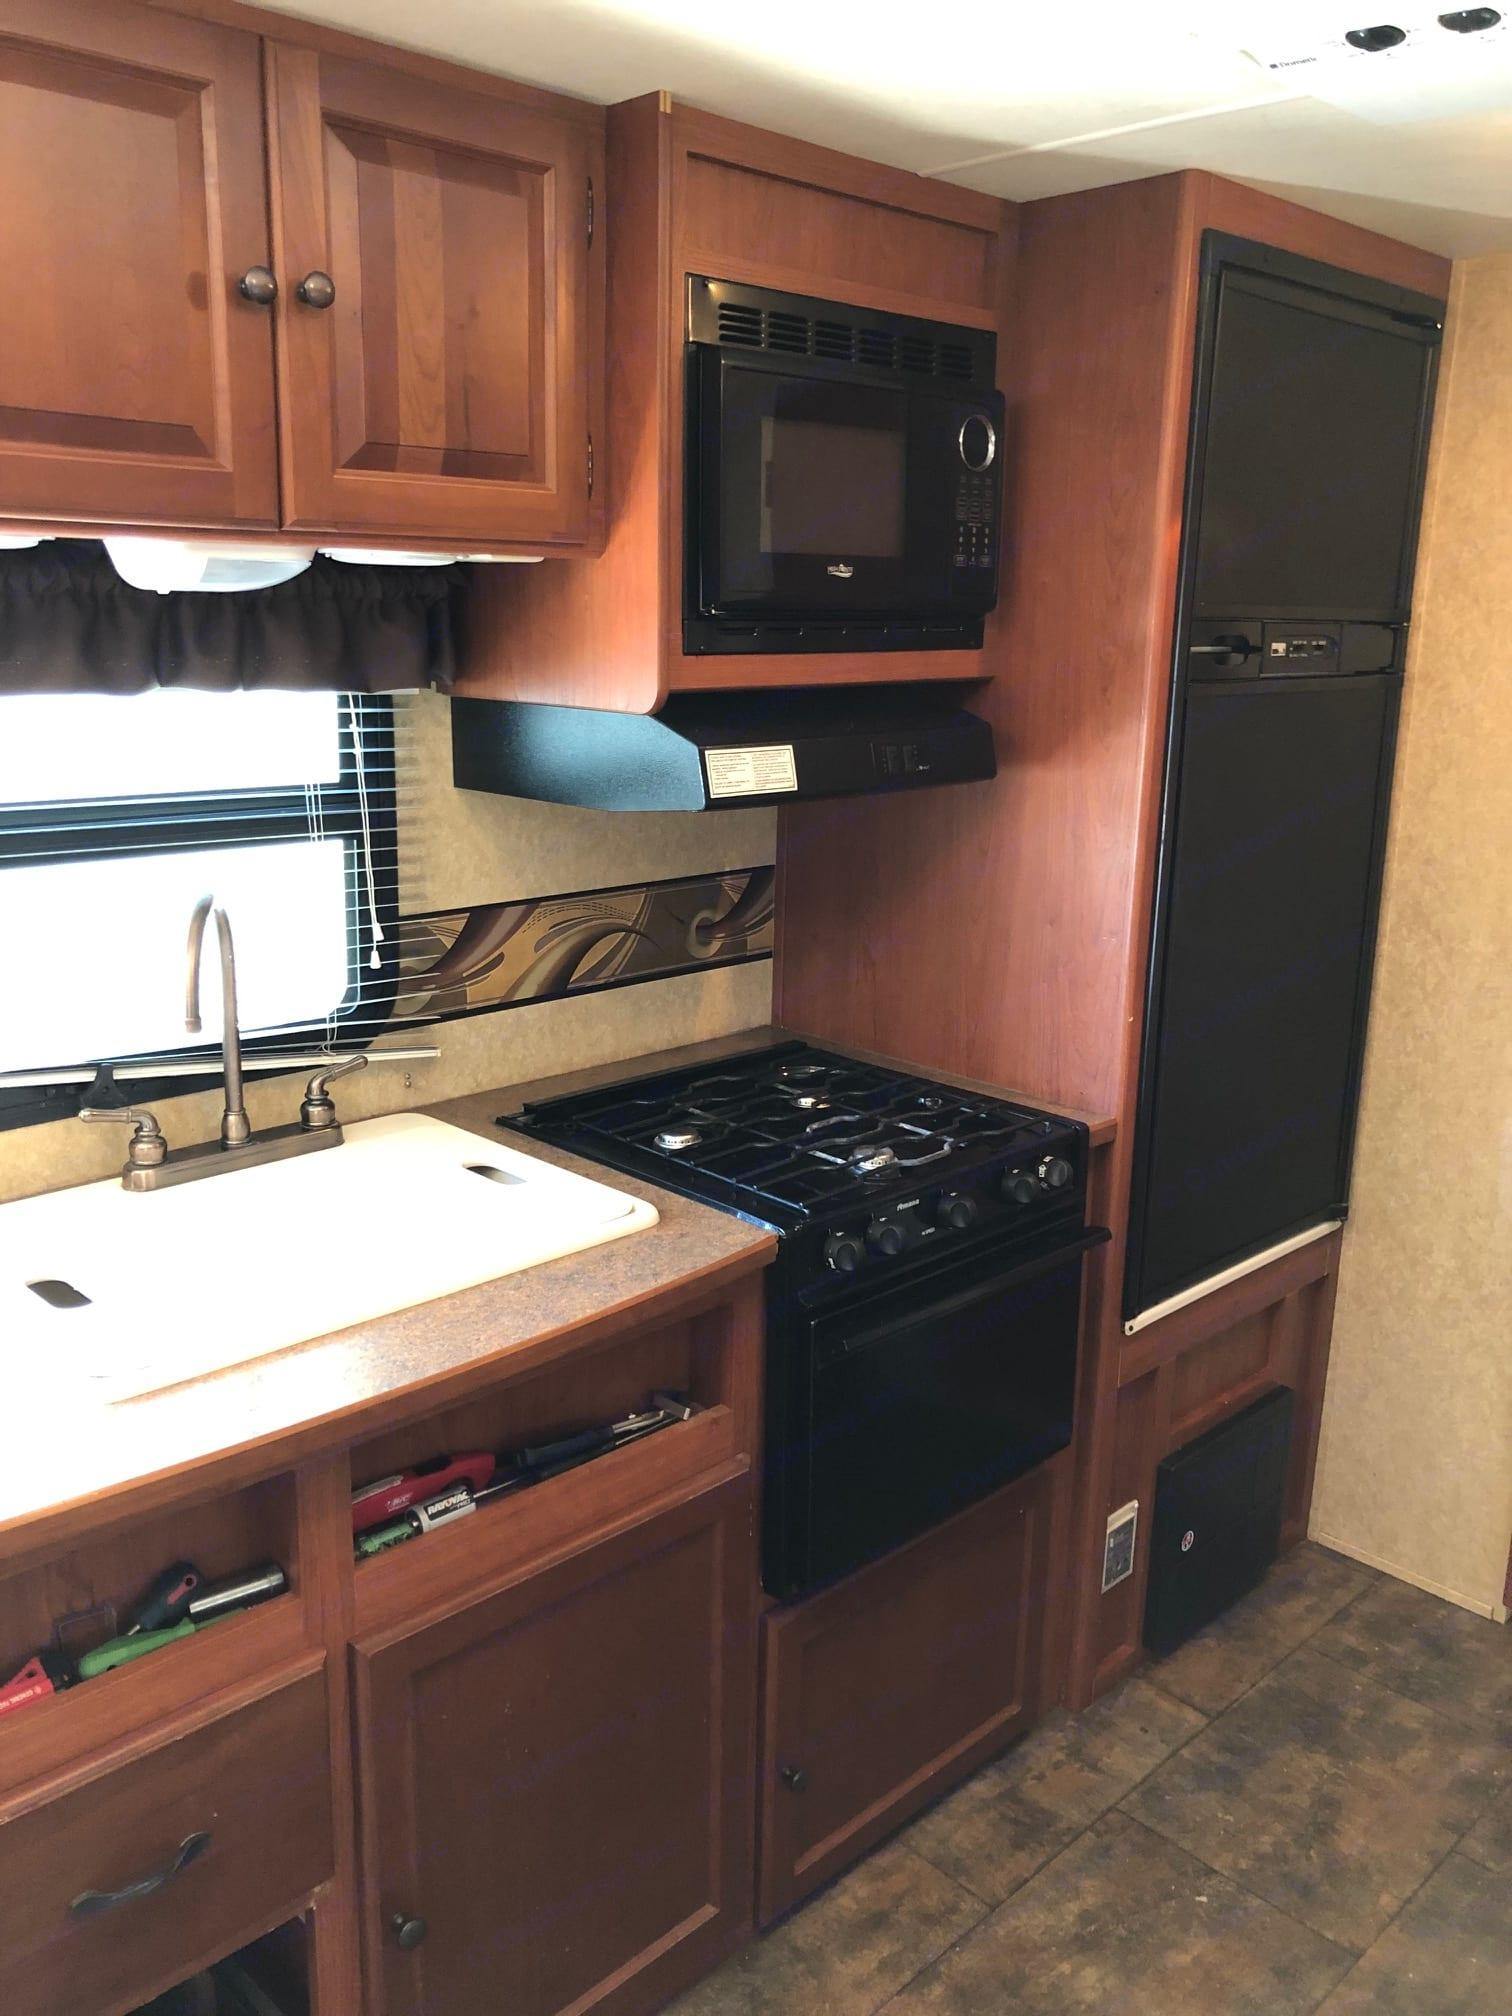 Kitchen with double sinks, propane range and oven, large capacity fridge and freezer. Aerolite Travel Trailer 2012